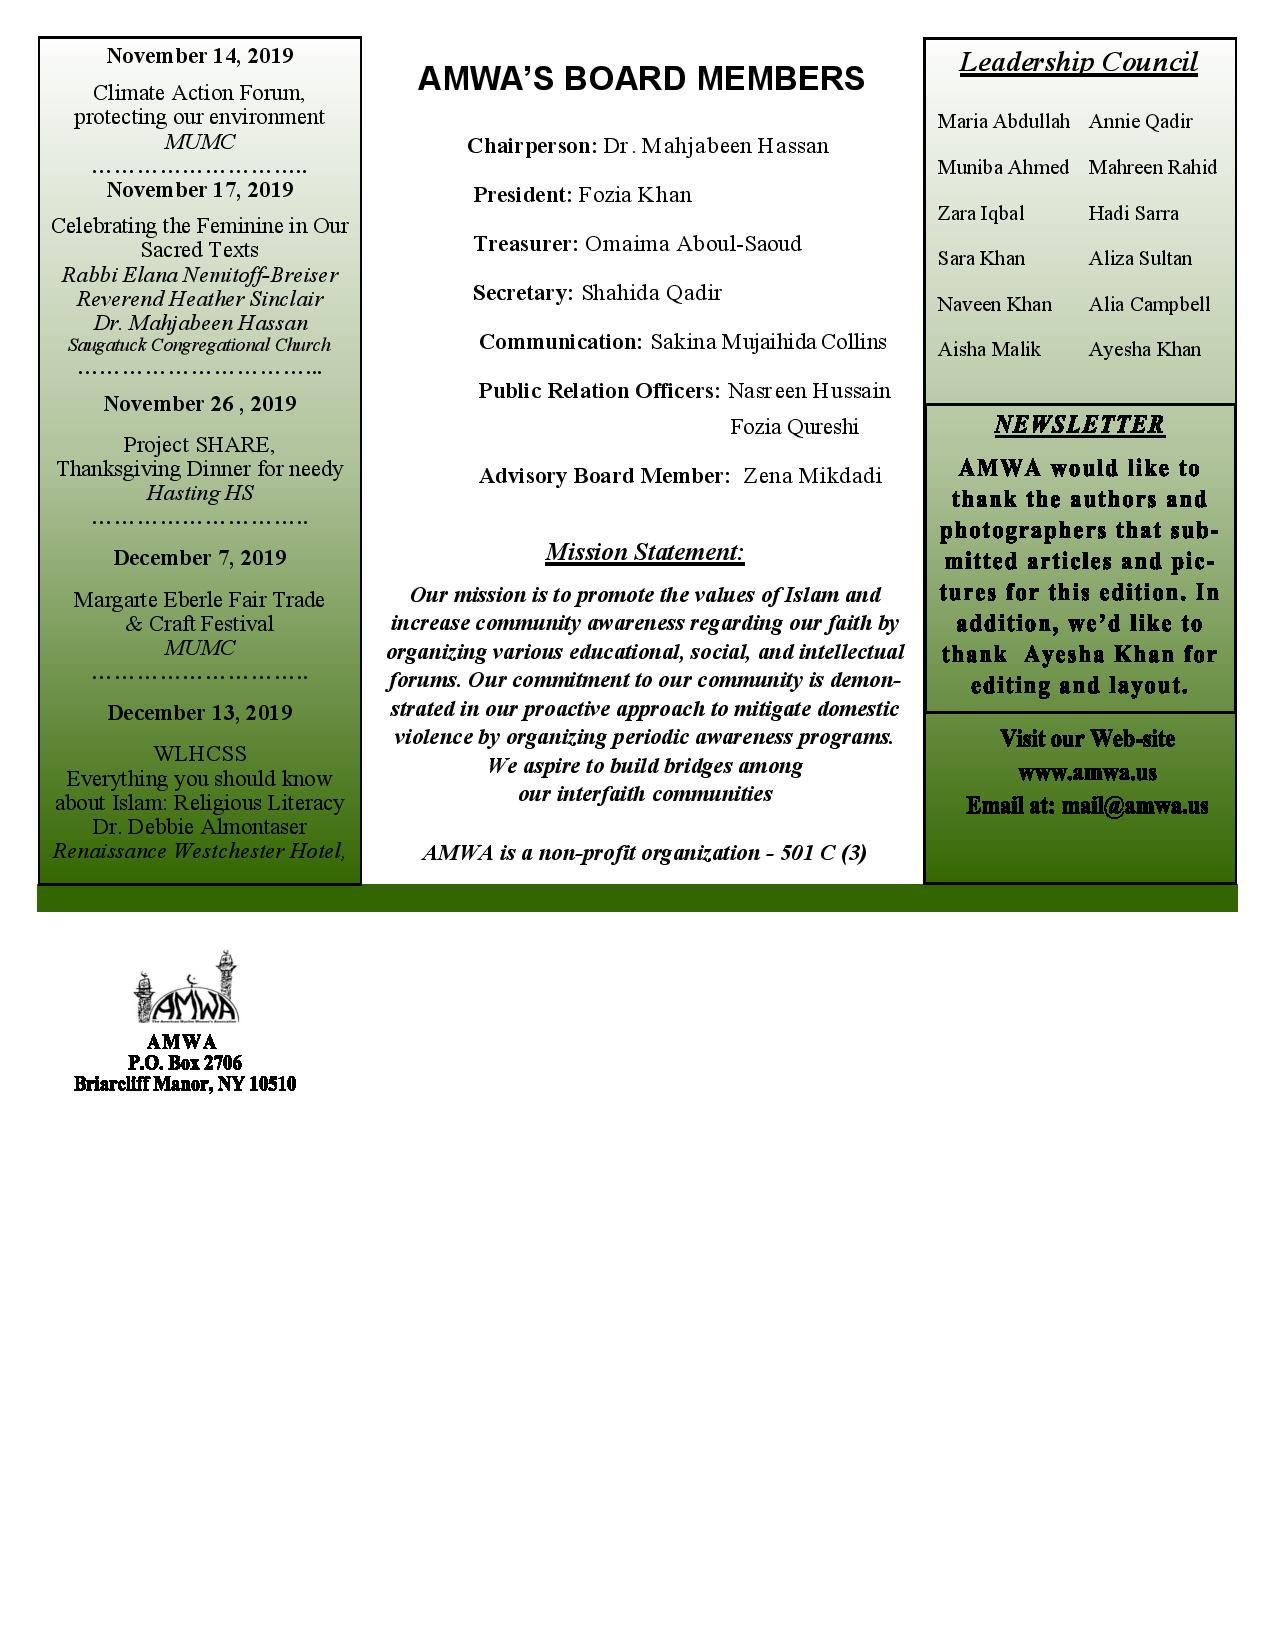 AMWA's Newsletter 2020